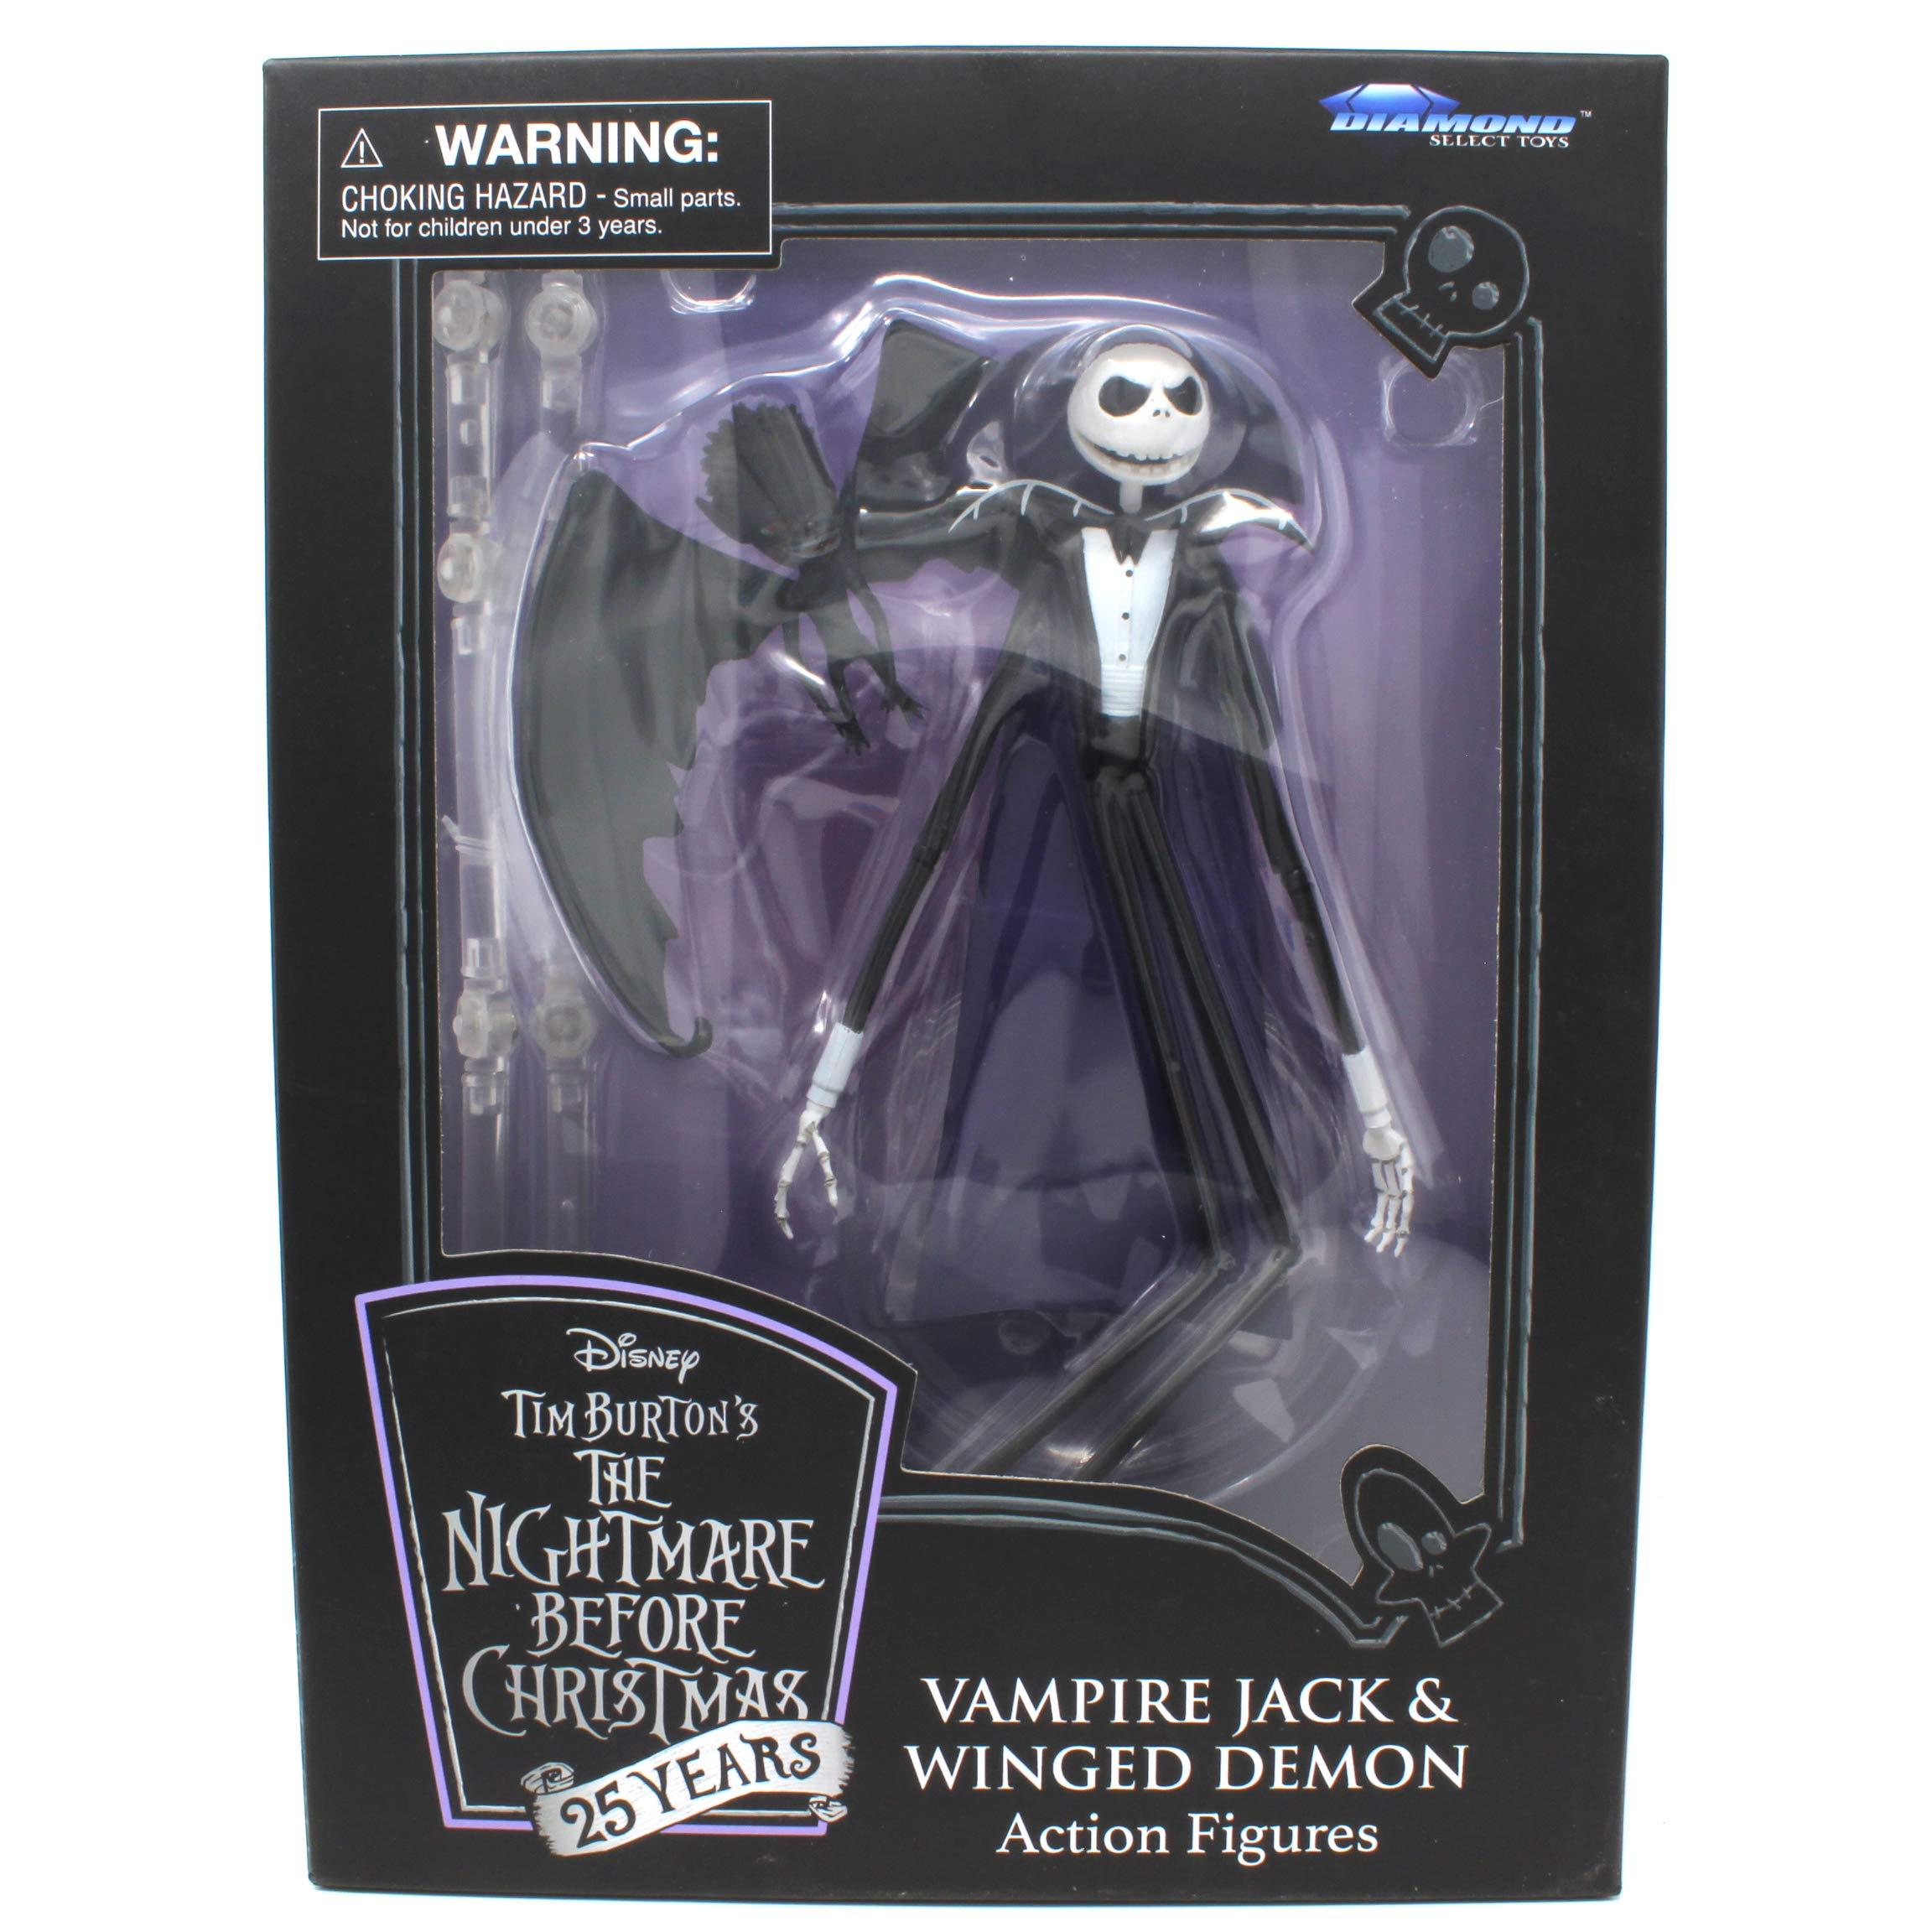 DIAMOND SELECT TOYS The Nightmare Before Christmas Vampire Jack & Winged Demon 25 Years Anniversary Figures